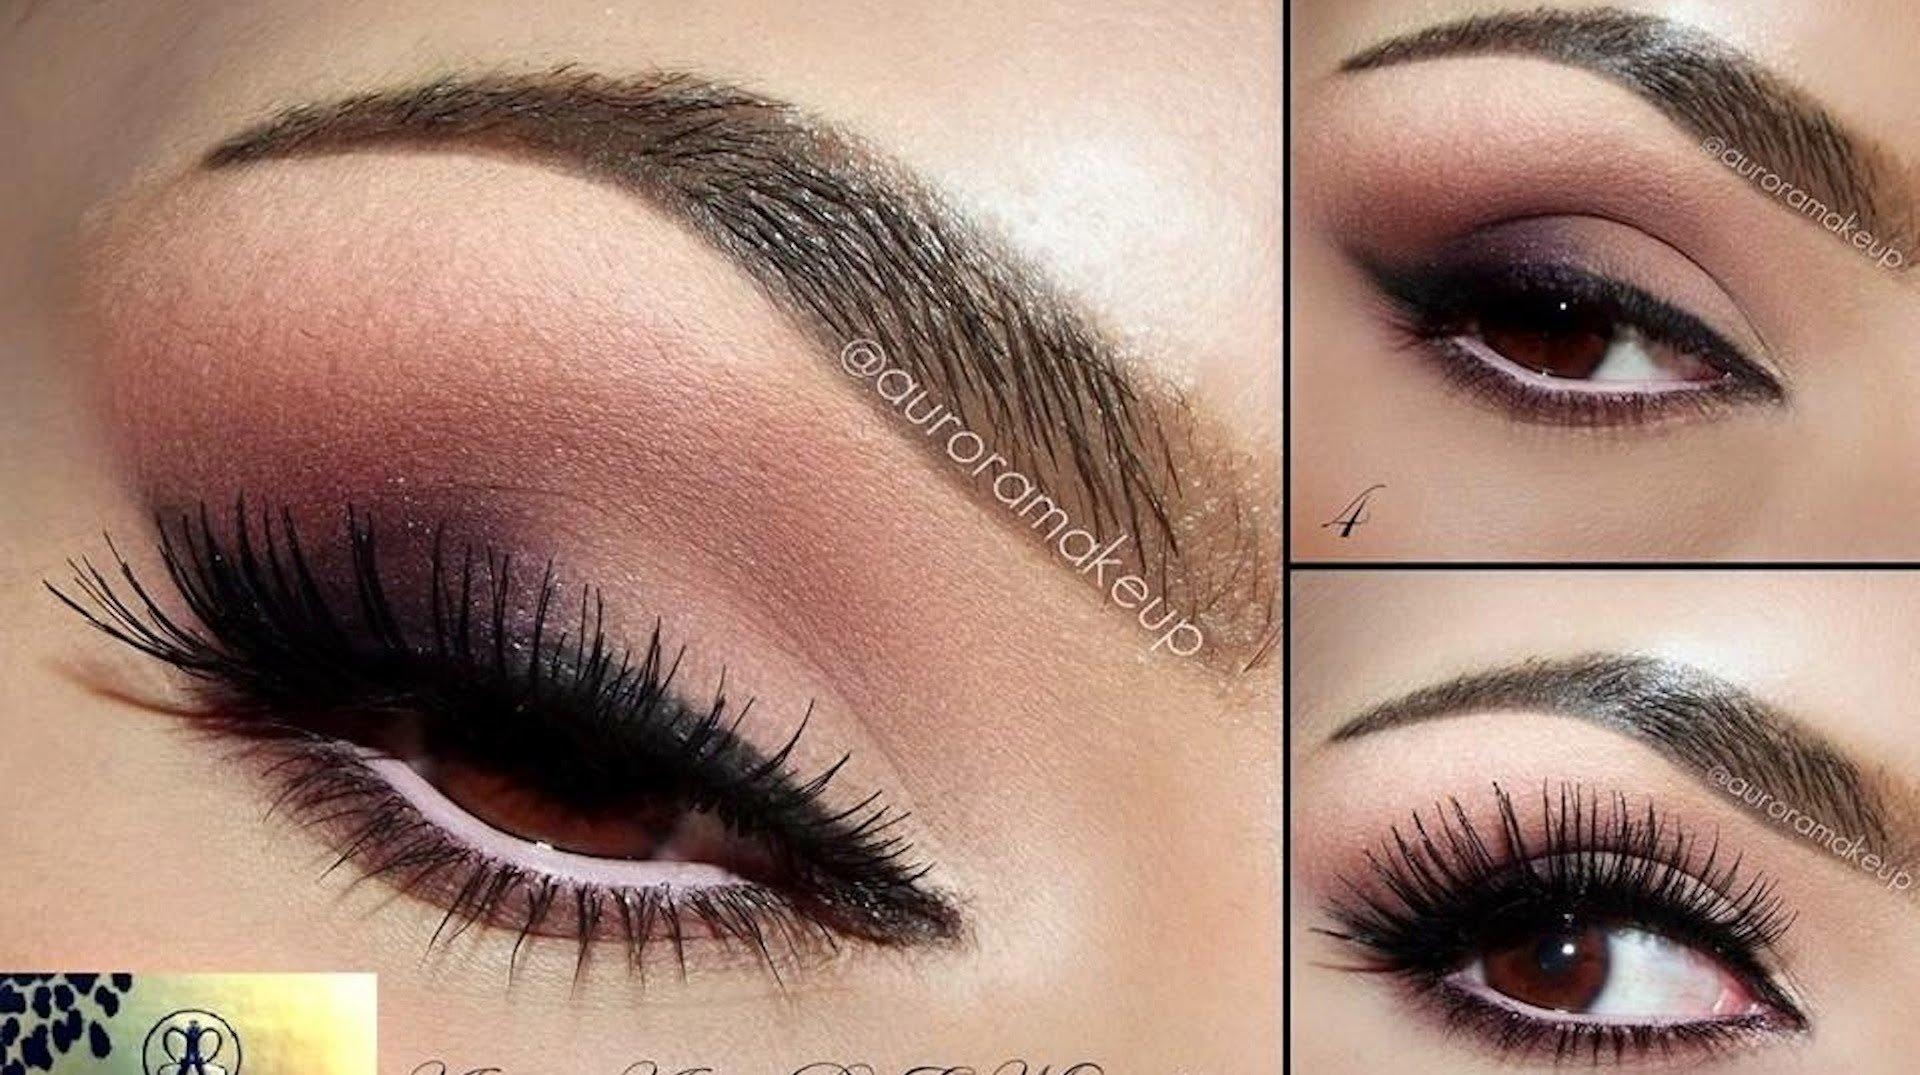 10 Unique Eye Makeup Ideas For Brown Eyes eye makeup ideas for brown eyes perfect 11 natural eye makeup brown 1 2020